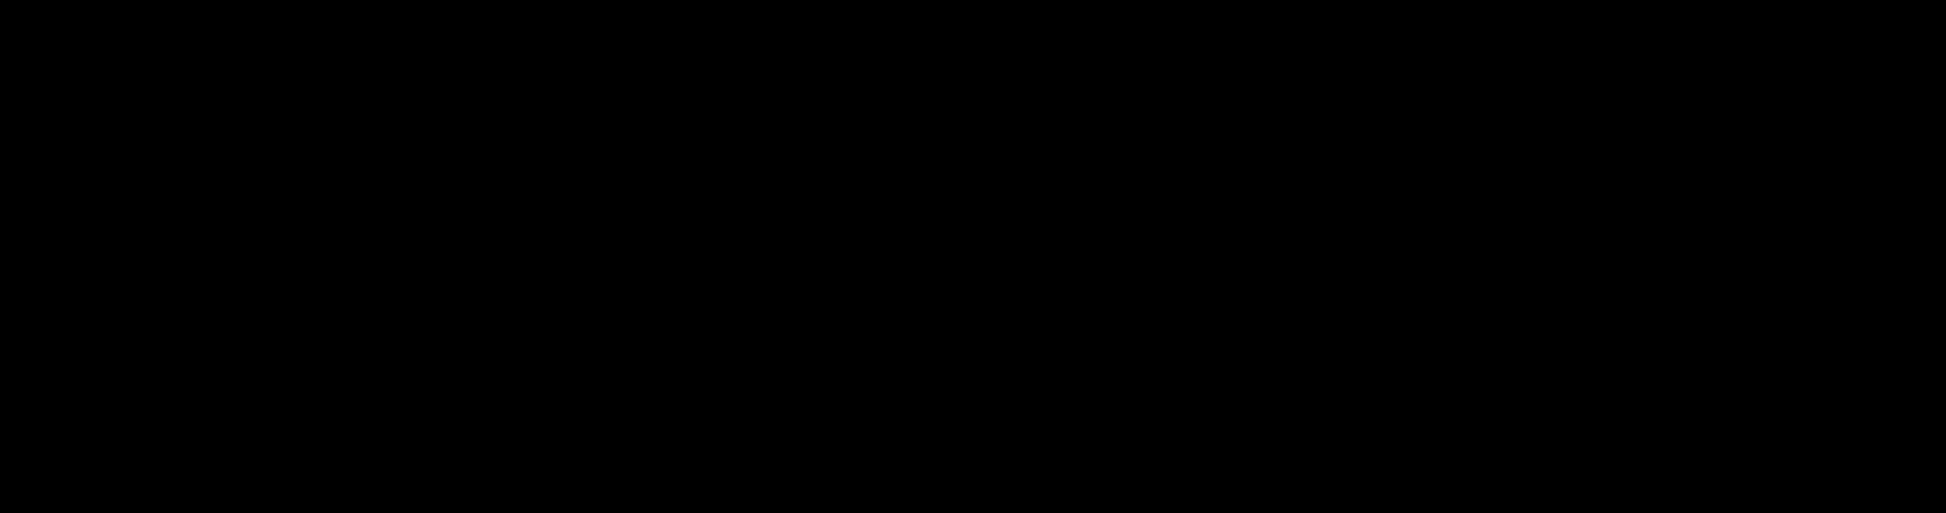 image37.png